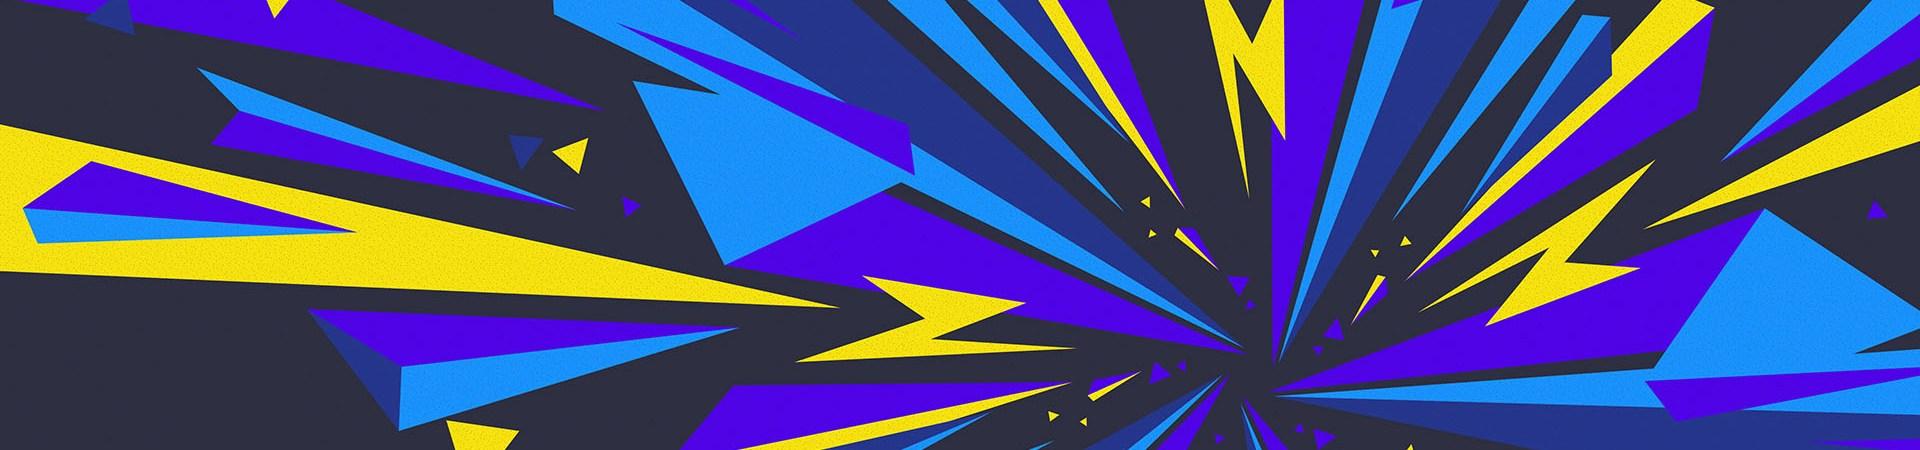 Broken Geometric Shapes by themefire